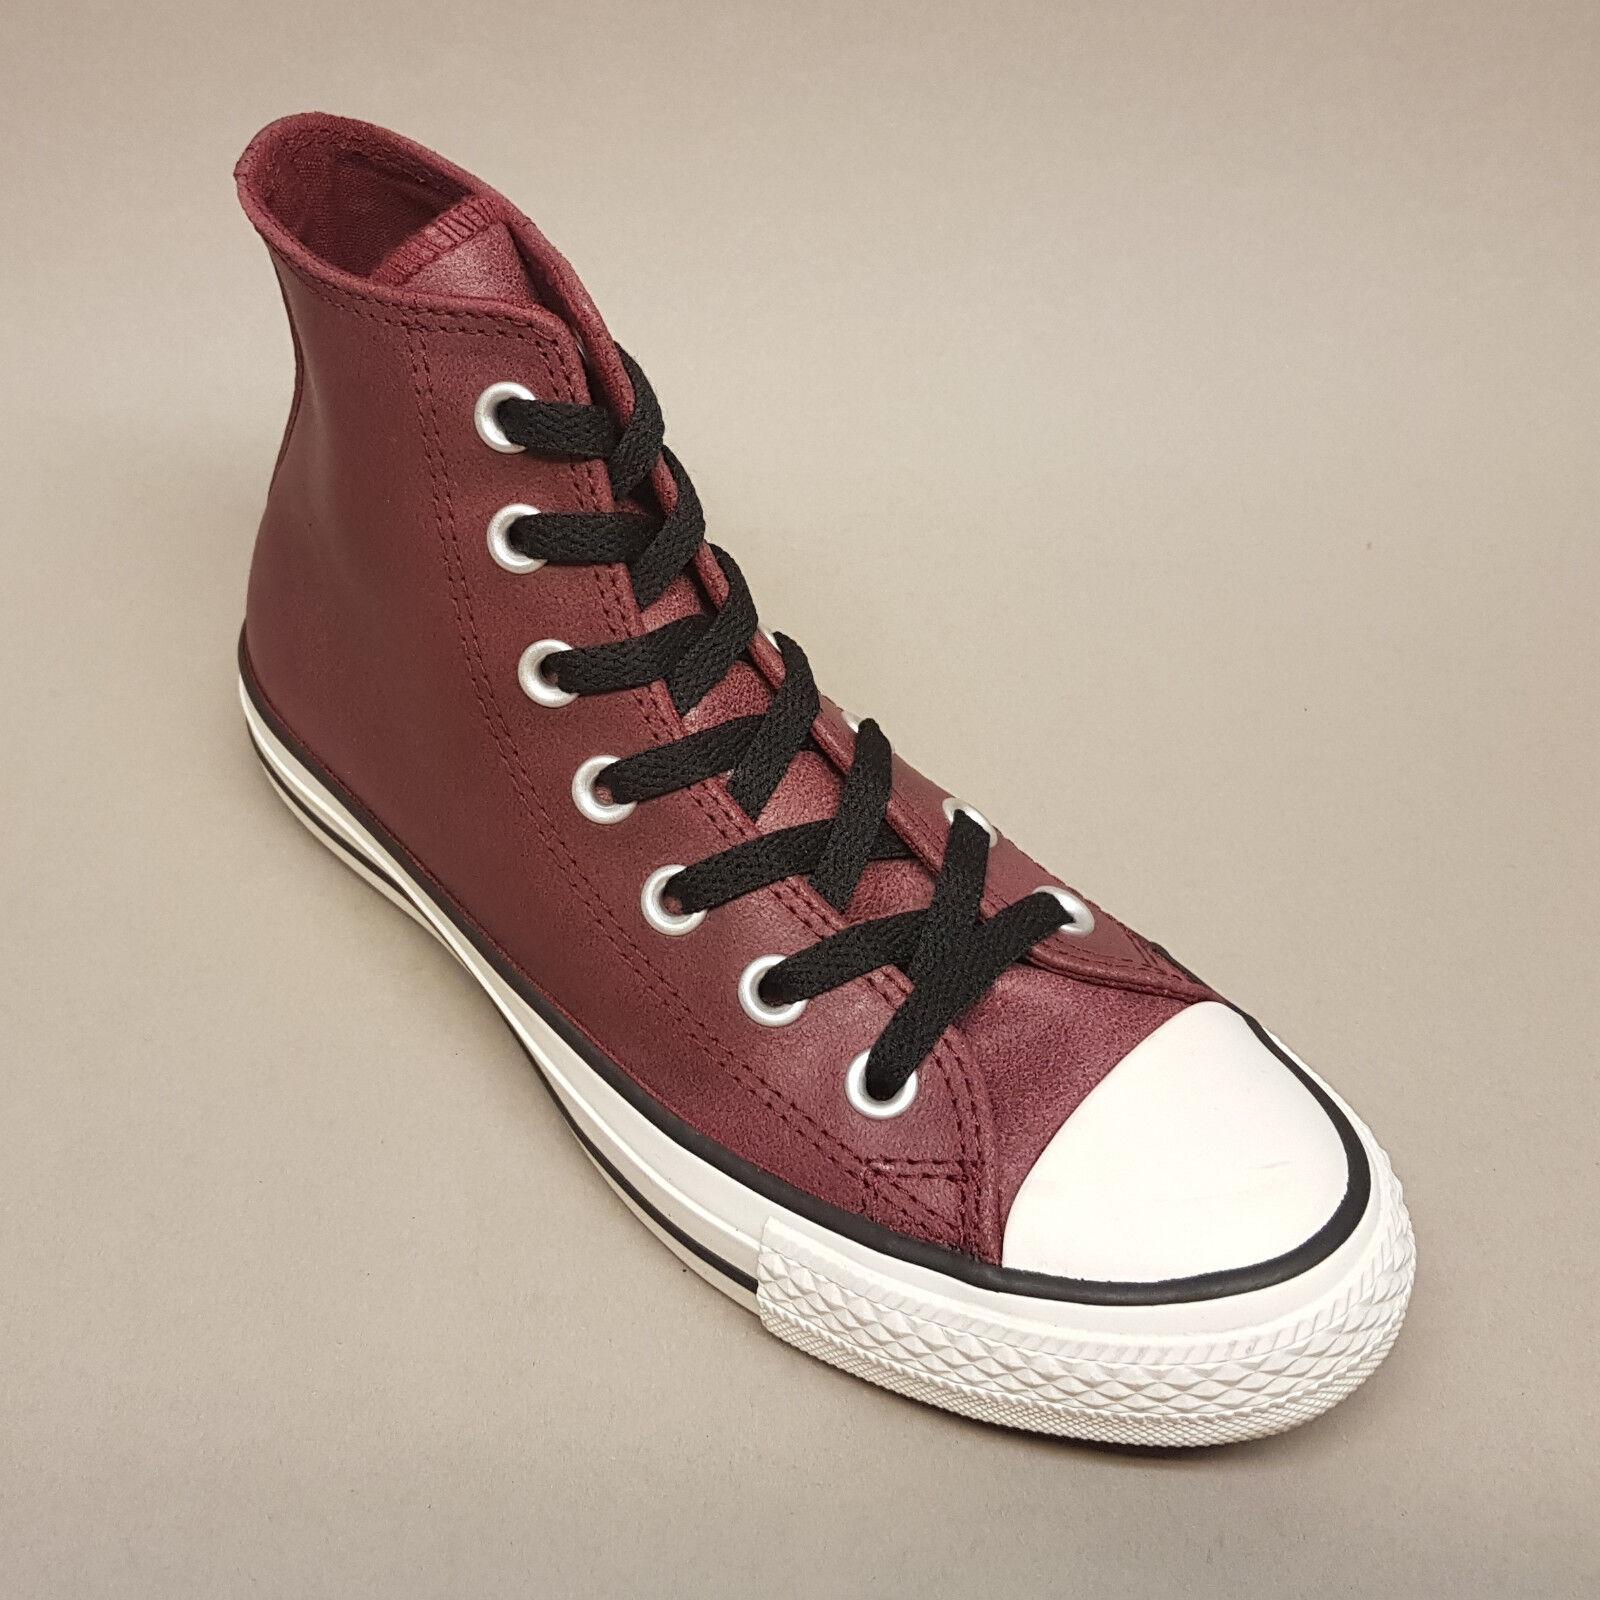 Converse All Star Chuck Hi Oxheart rot Leder 144762C Turnschuhe Sneaker rot Oxheart Leder 0d8e12